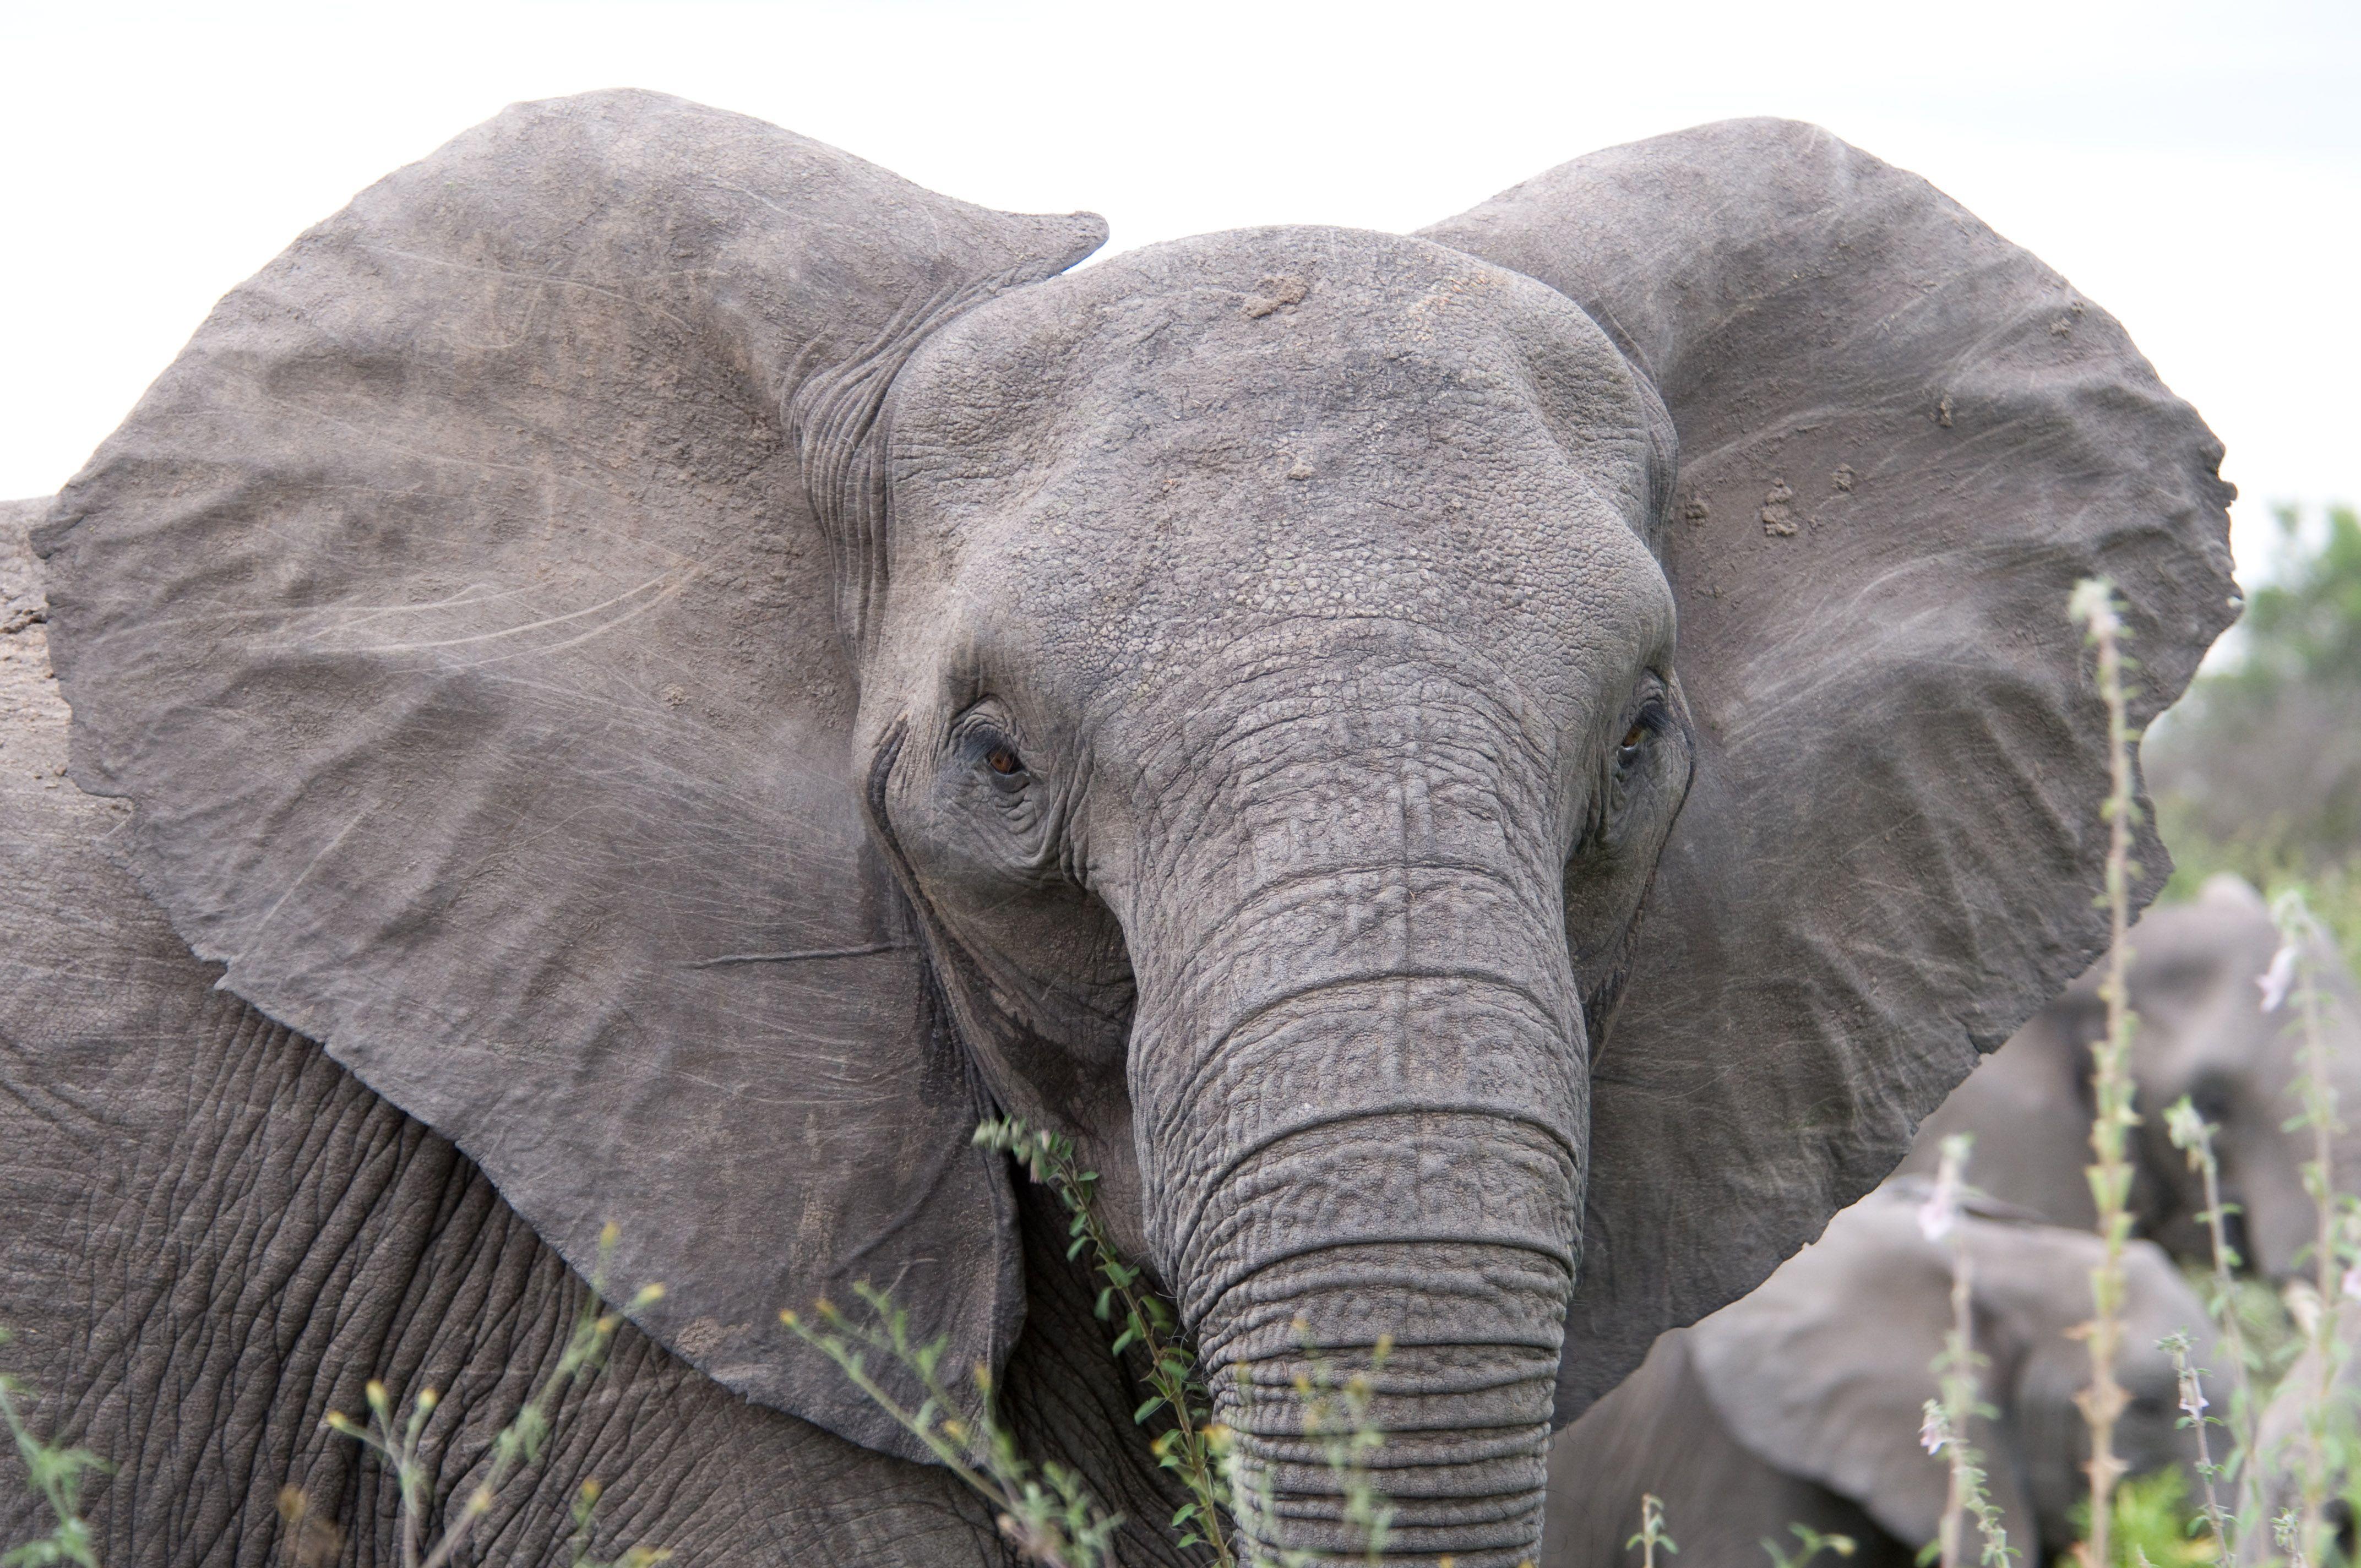 File:Angry elephant ears.jpg | Animals | Pinterest | Elephant ears ...